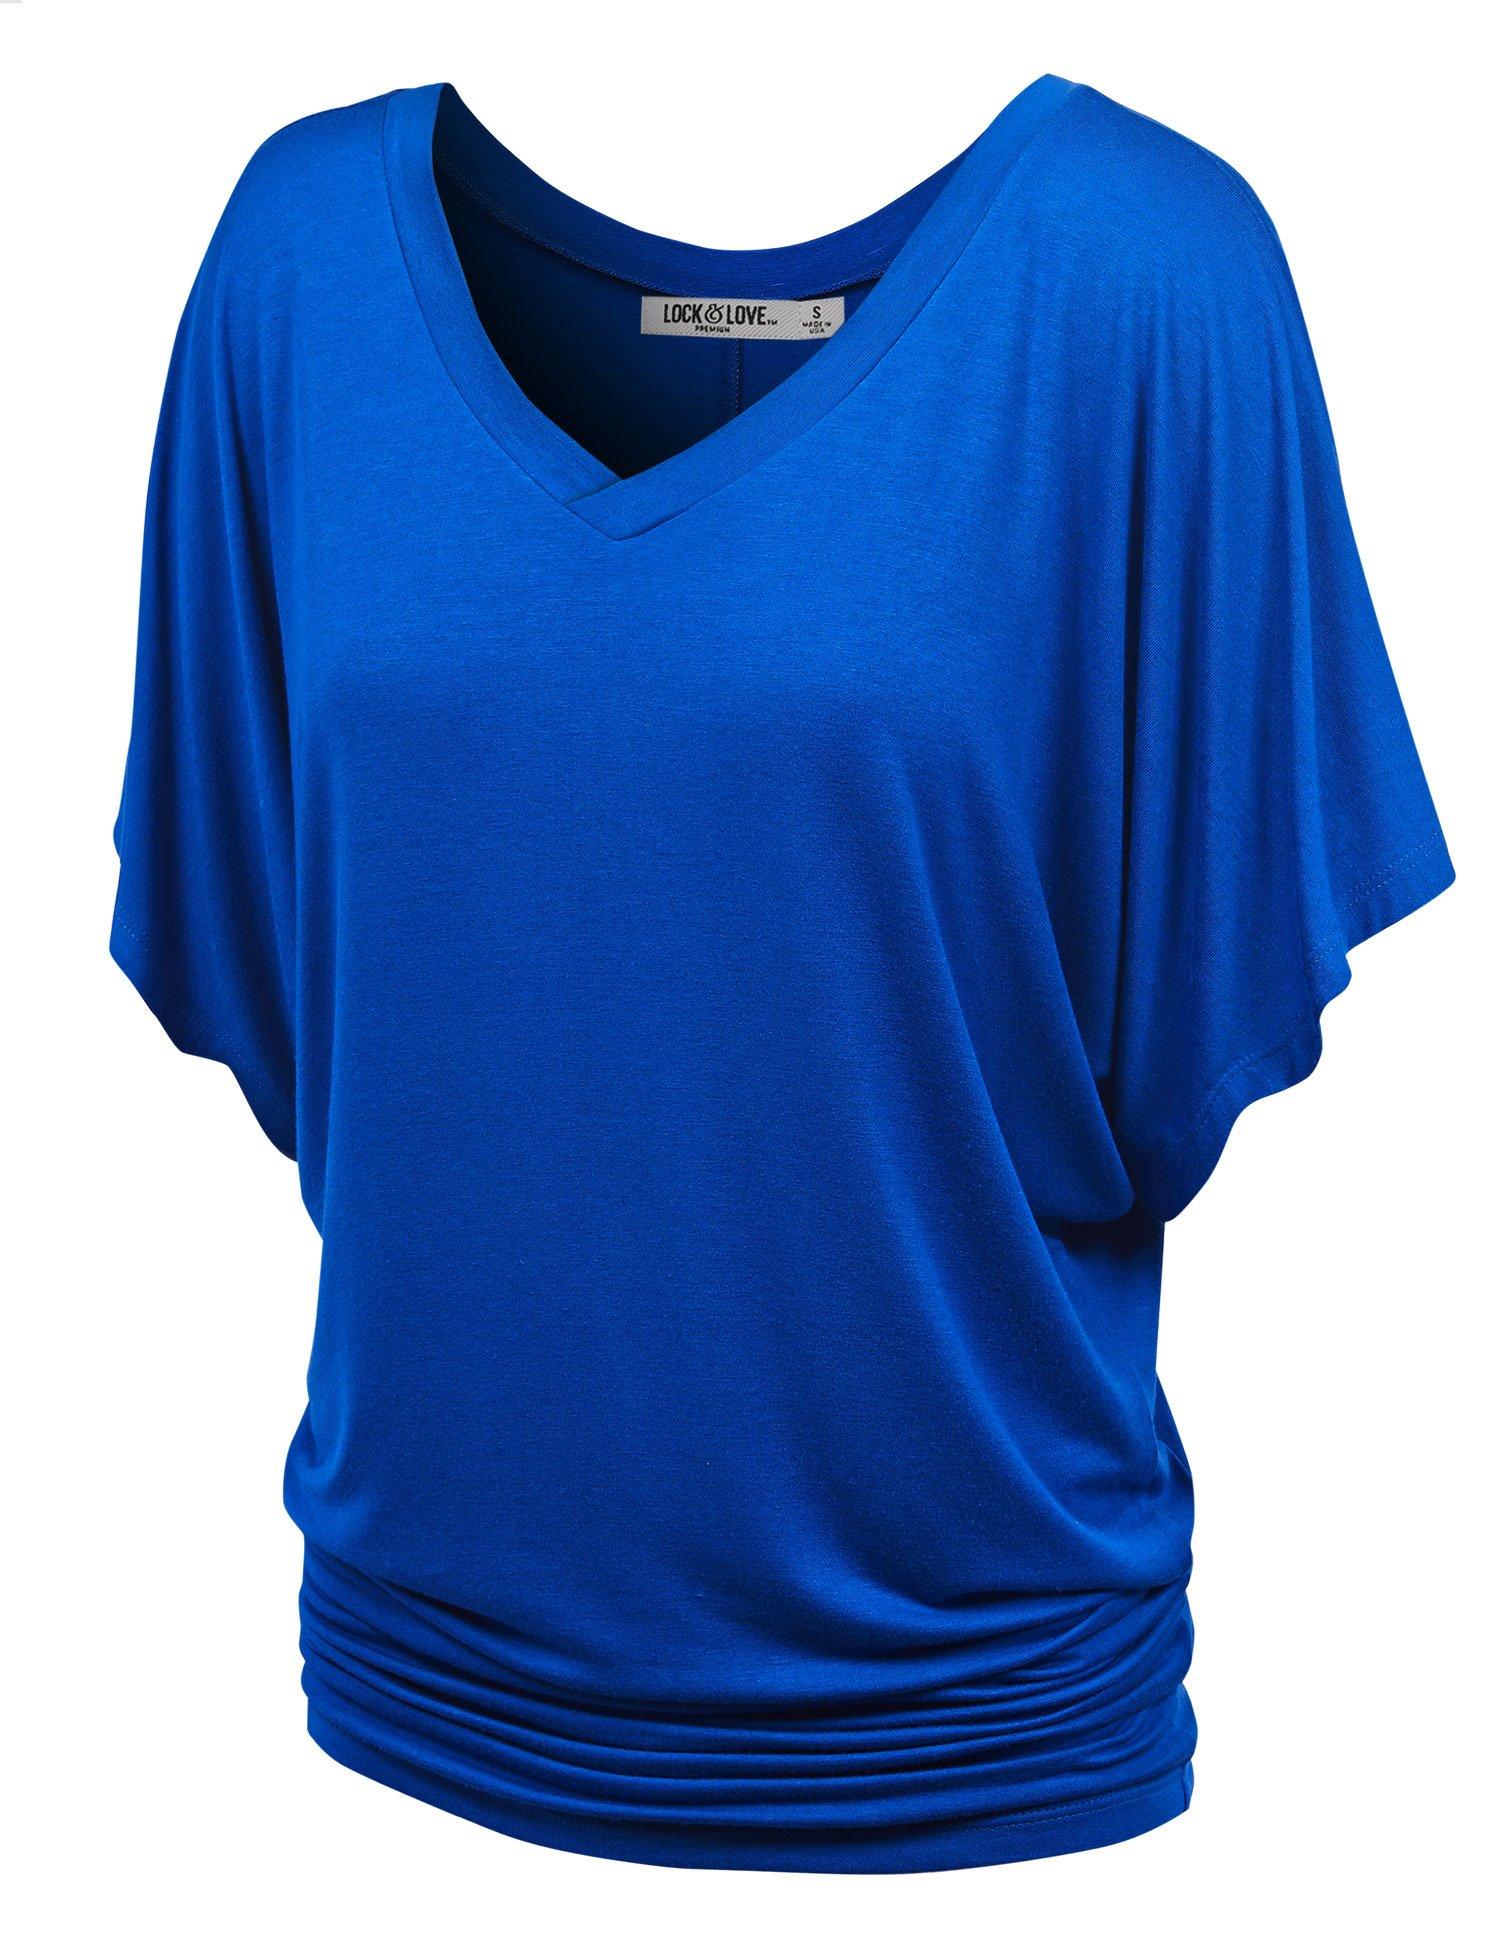 WT1038 Womens V Neck Short Sleeve Dolman Top L COBALT_BLUE